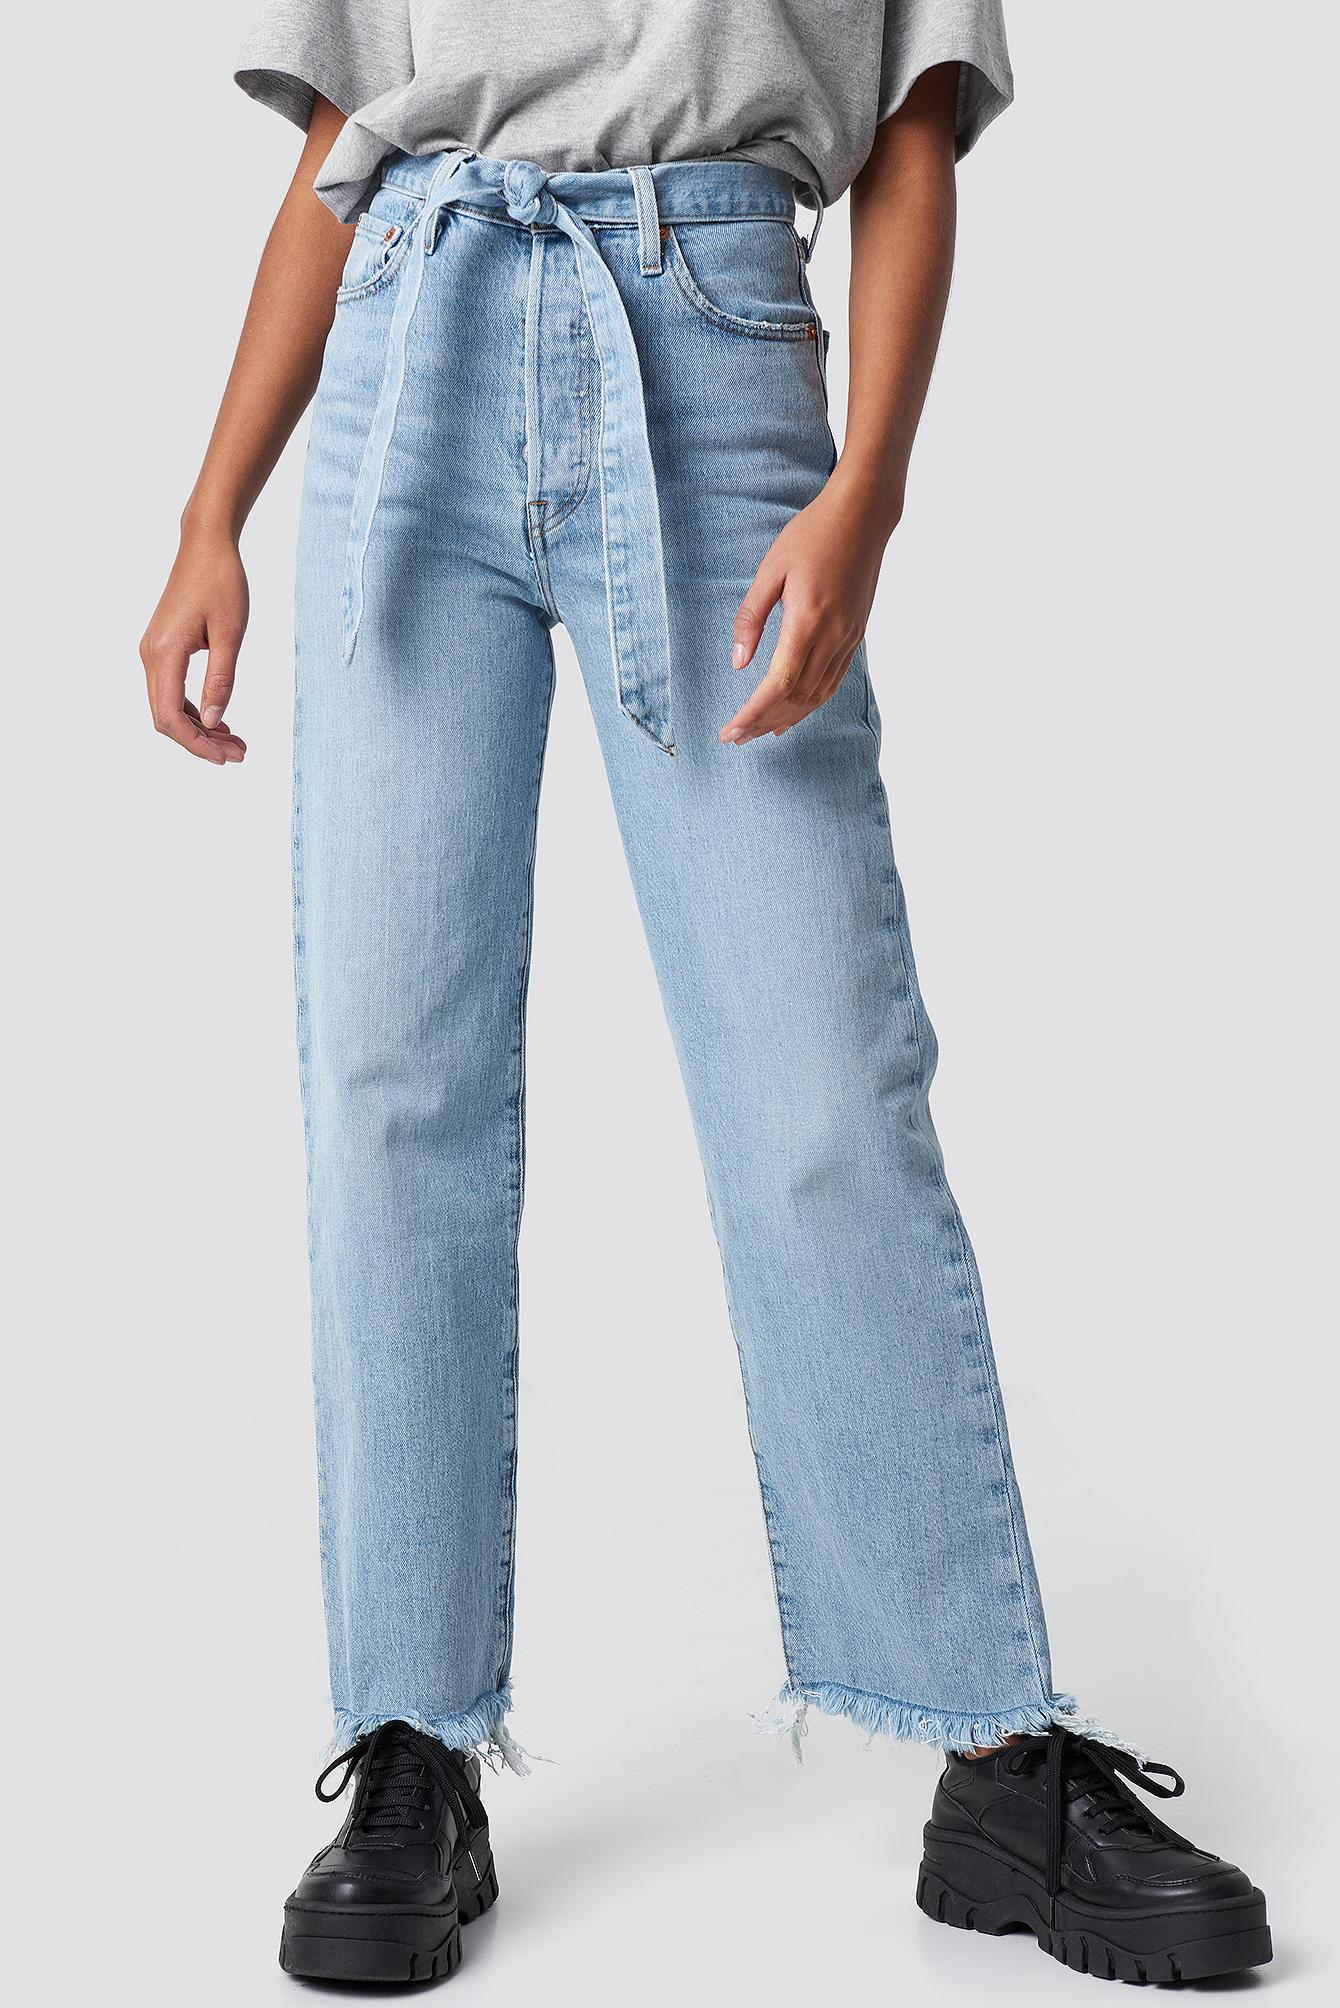 Ribcage Jeans NA-KD.COM